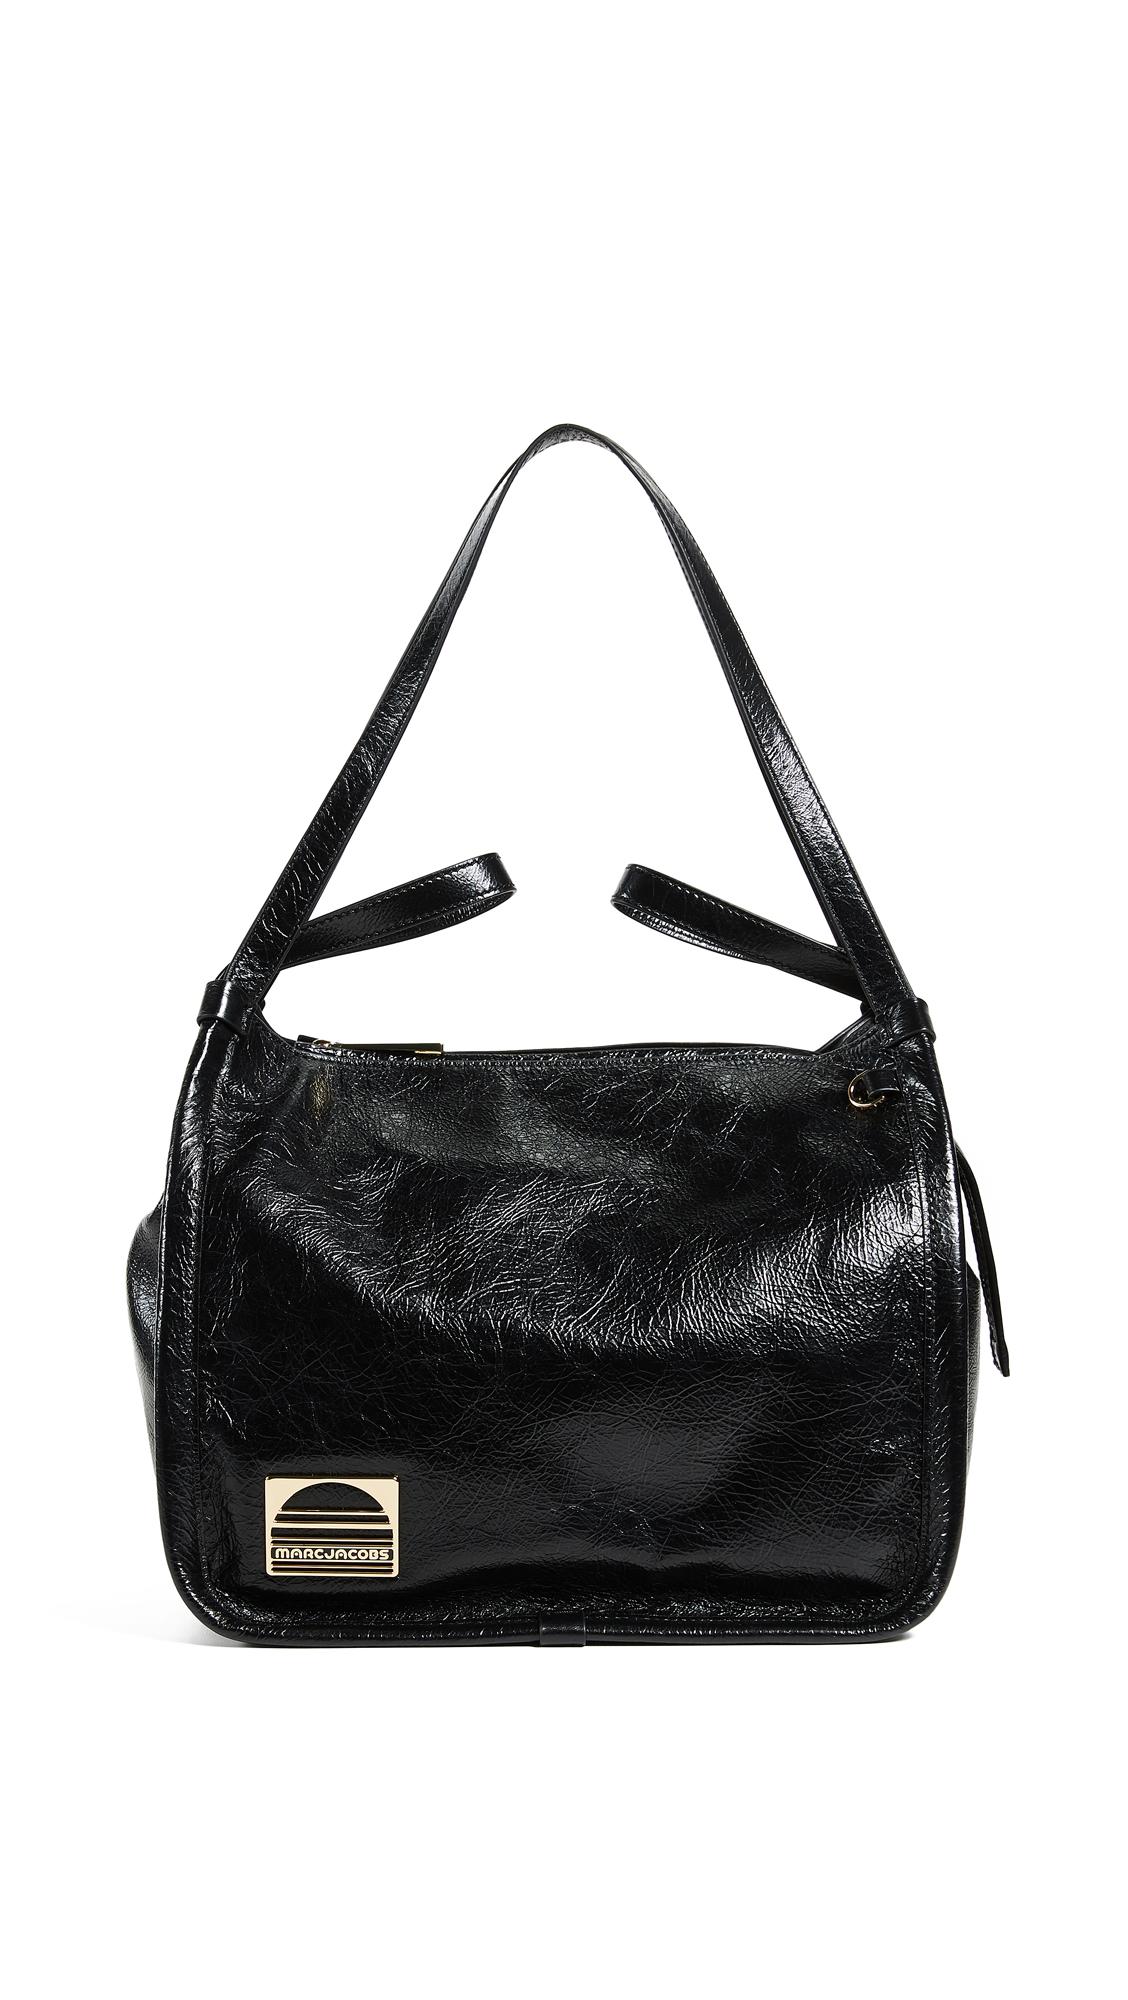 Marc Jacobs Sport Bag Shopping Tote - Black